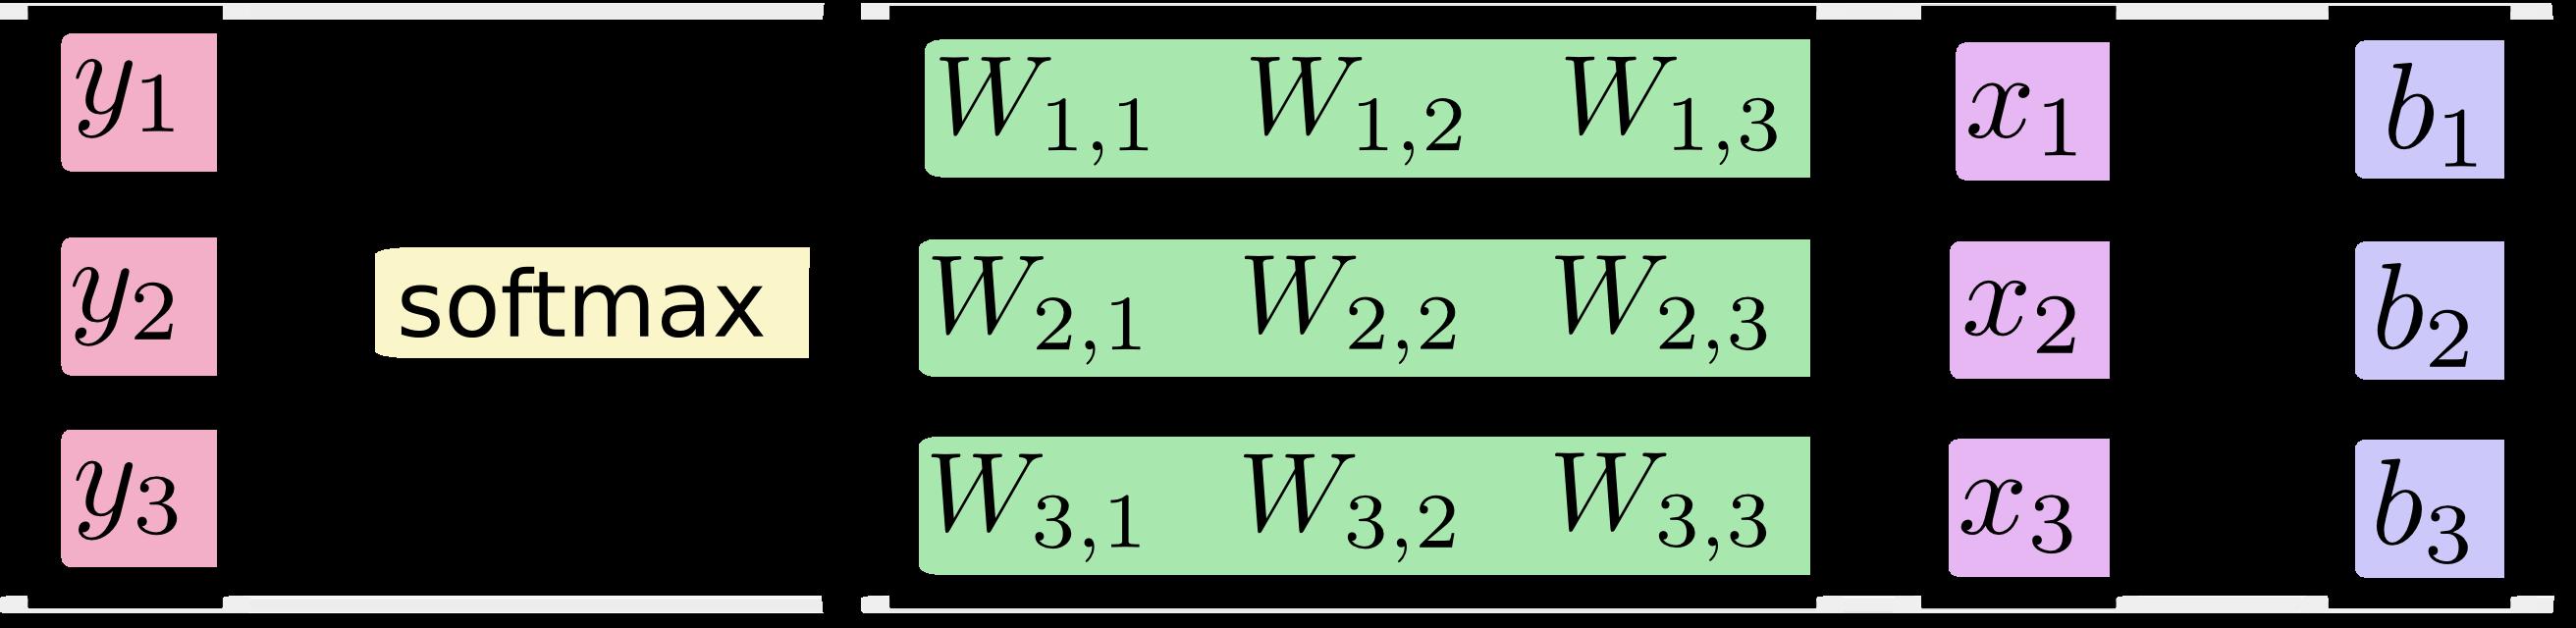 [y1, y2, y3] = softmax([[W11, W12, W13], [W21, W22, W23], [W31, W32, W33]]*[x1, x2, x3] + [b1, b2, b3])